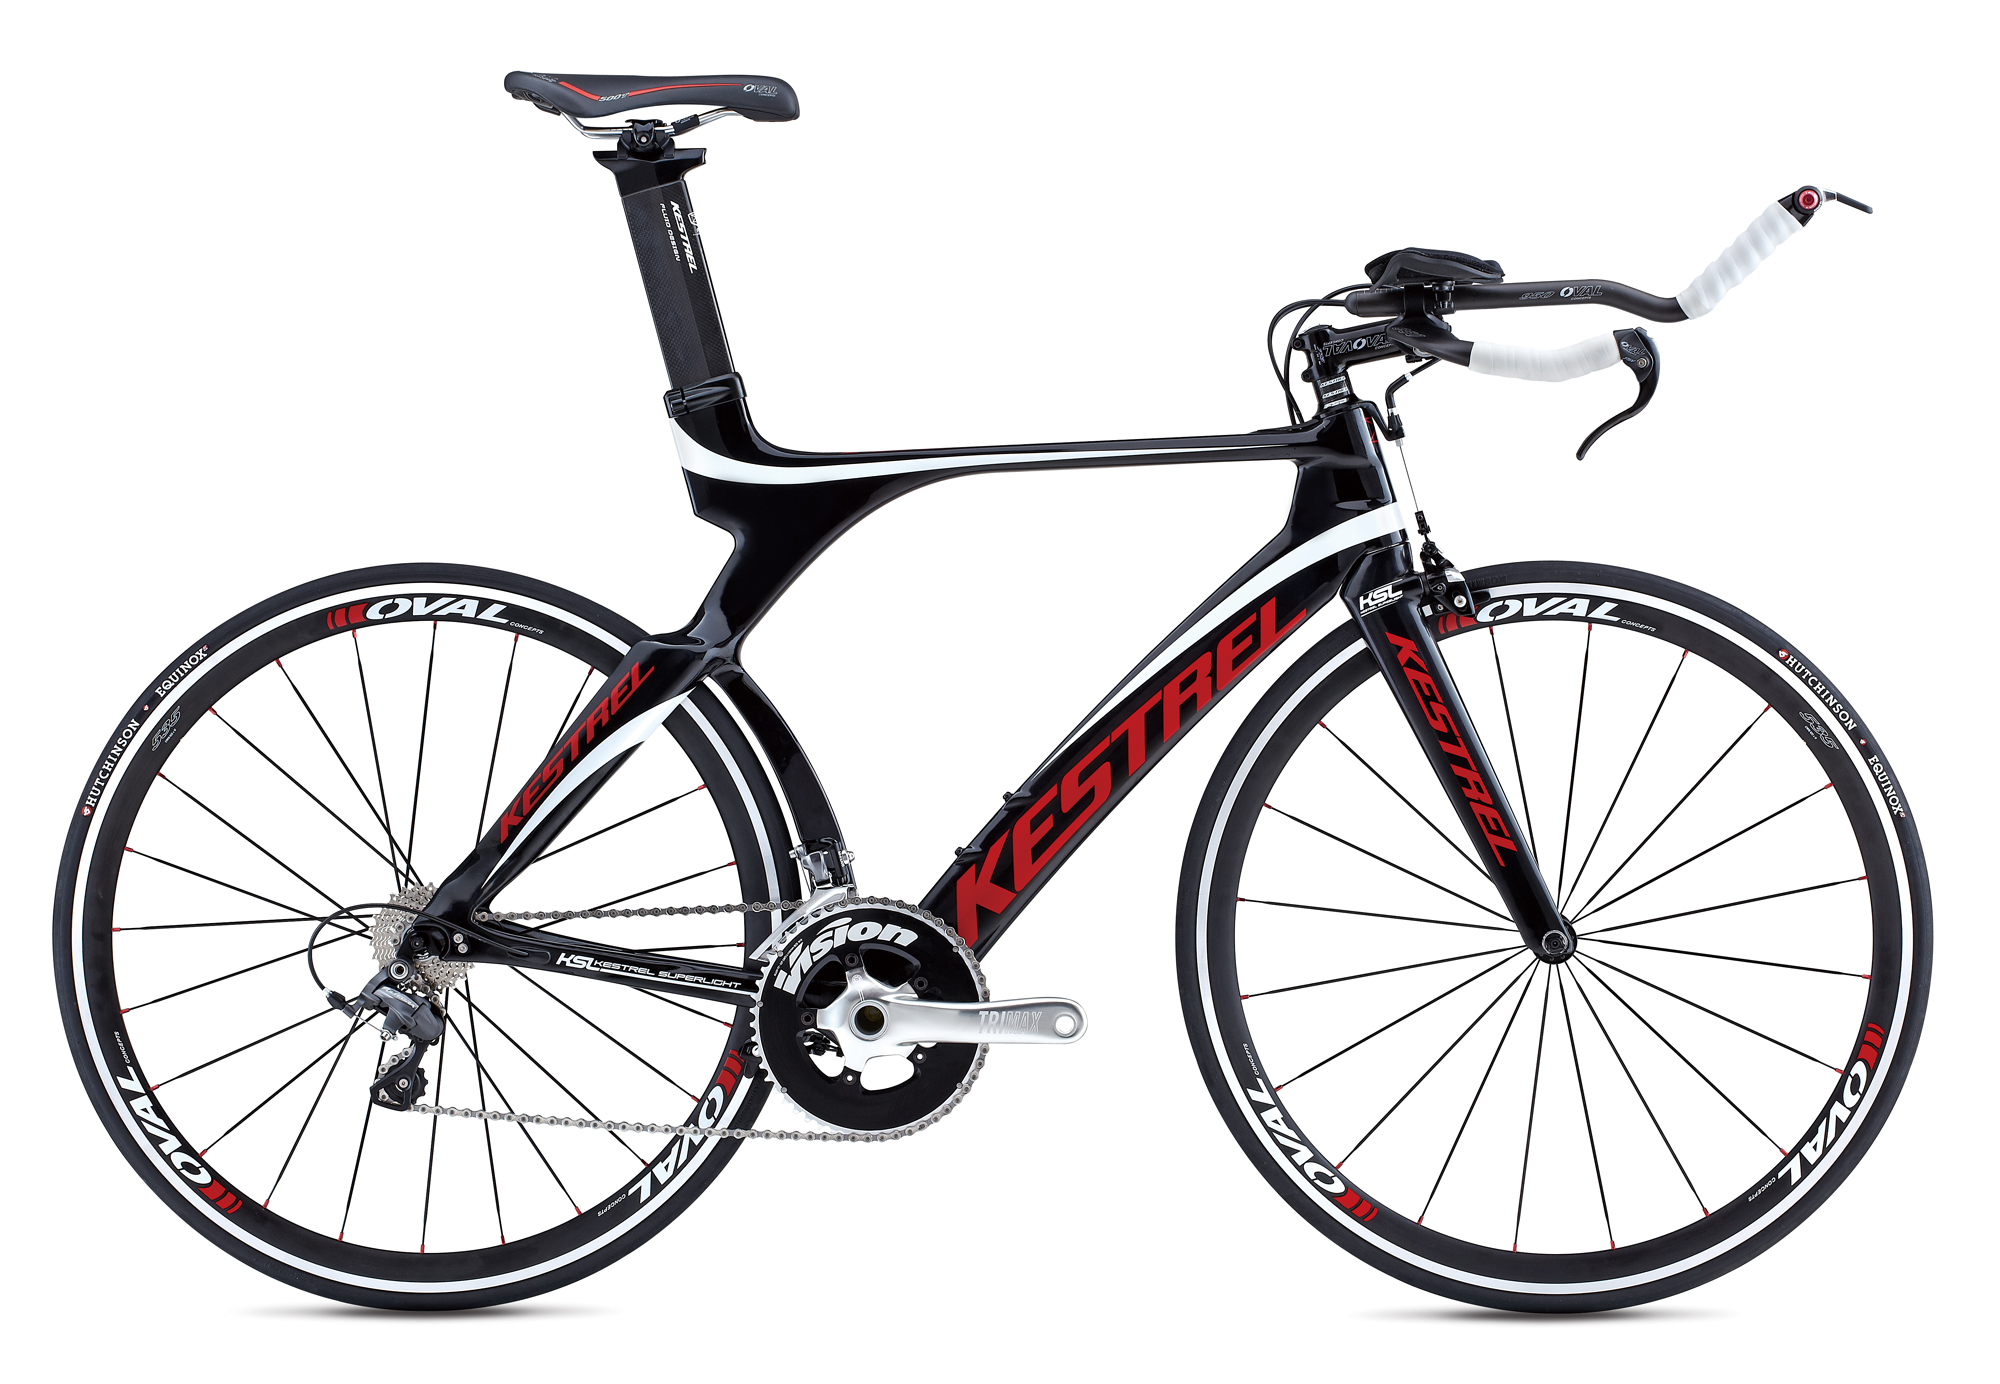 Road Bikes Kestrel 2013 4000 Pro Sl Ultegra 4000 Pro Sl